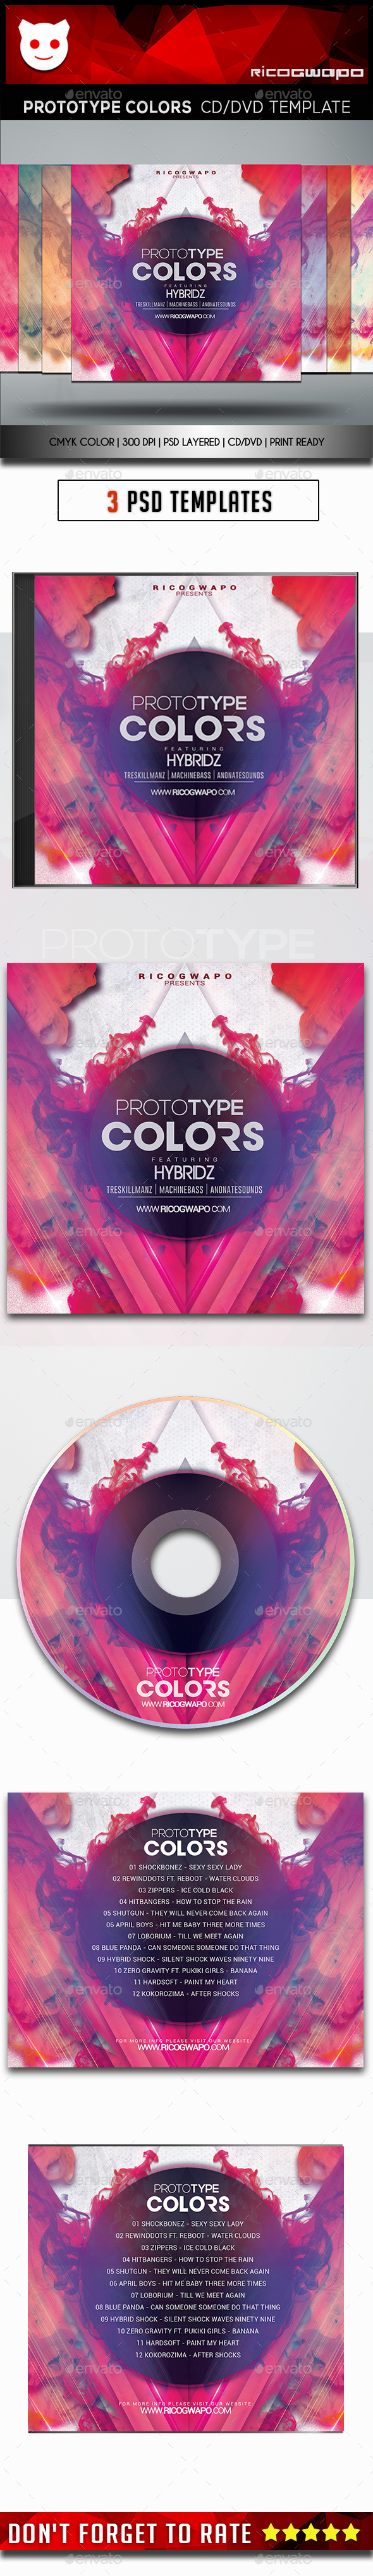 Prototype Colors Cd/DVD Template - CD & DVD Artwork Print Templates